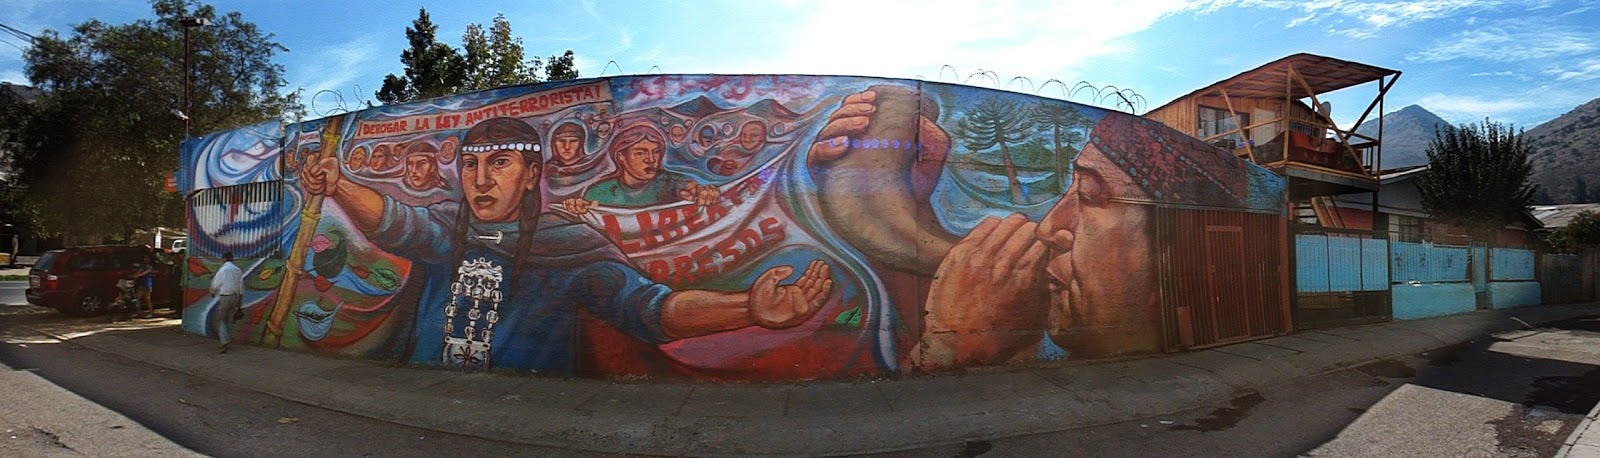 (Chile) Prisioneros Políticos Mapuches en Huelga de Hambre  Marichiweu+final+2para+blog